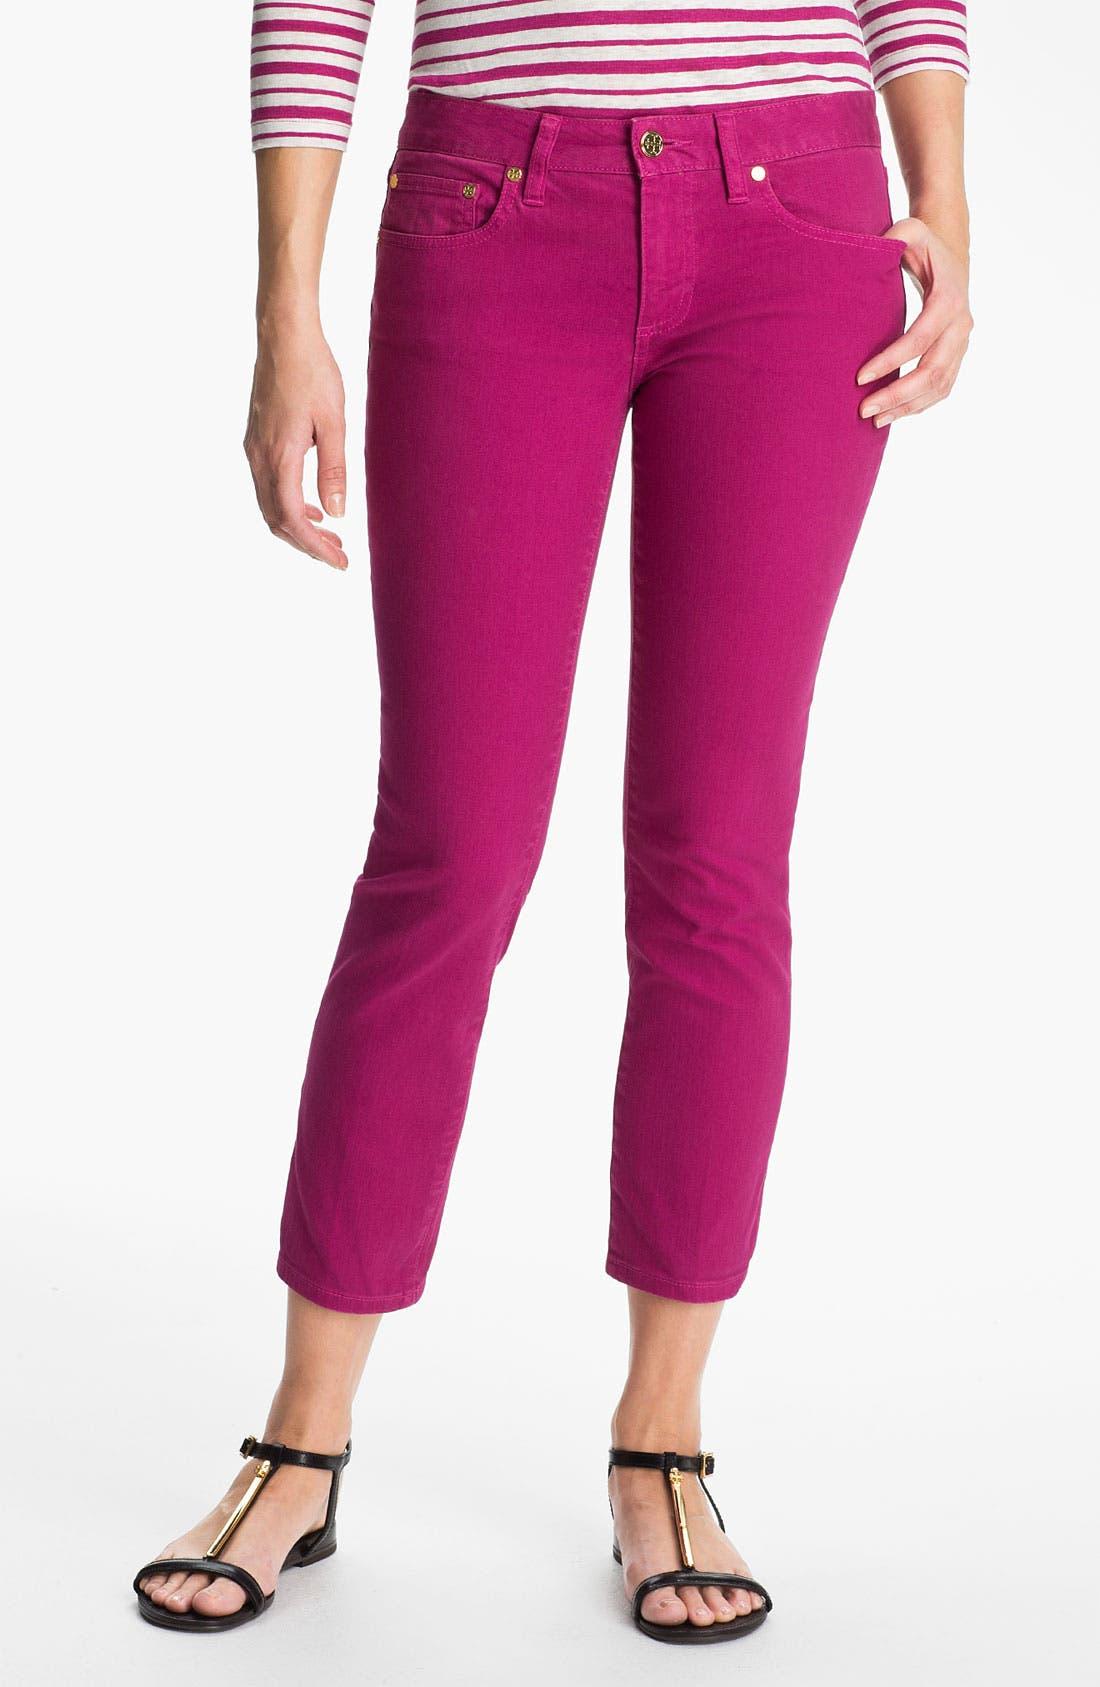 Main Image - Tory Burch 'Alexia' Crop Skinny Stretch Jeans